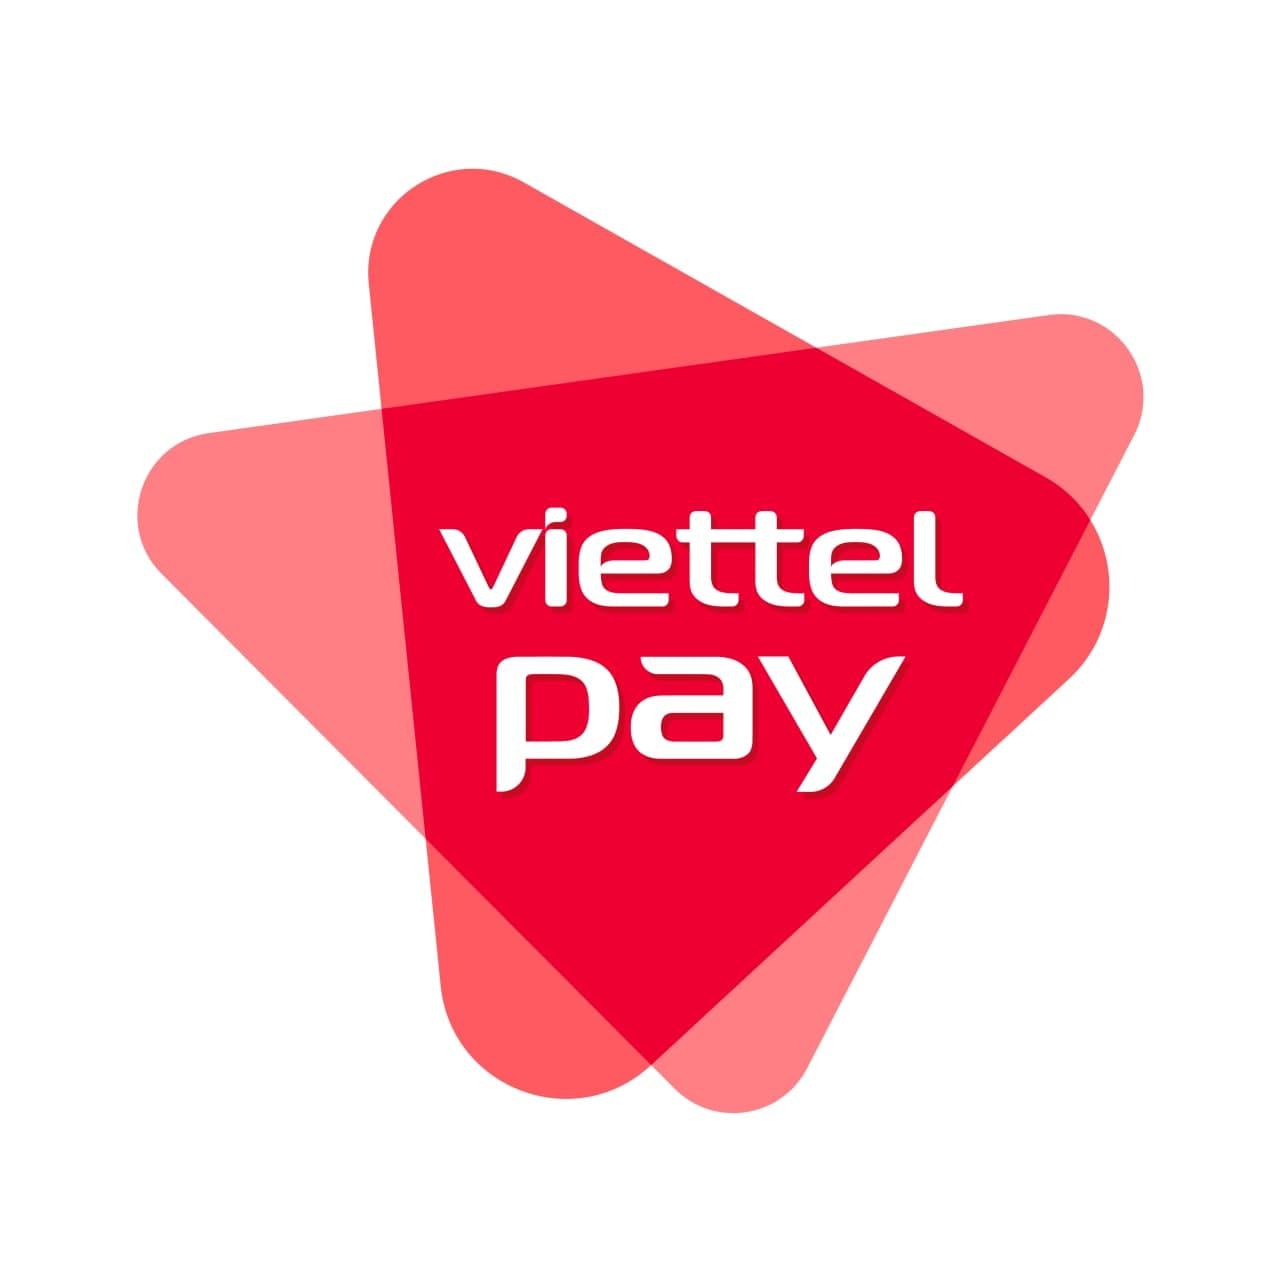 Viettel Pay.jpg